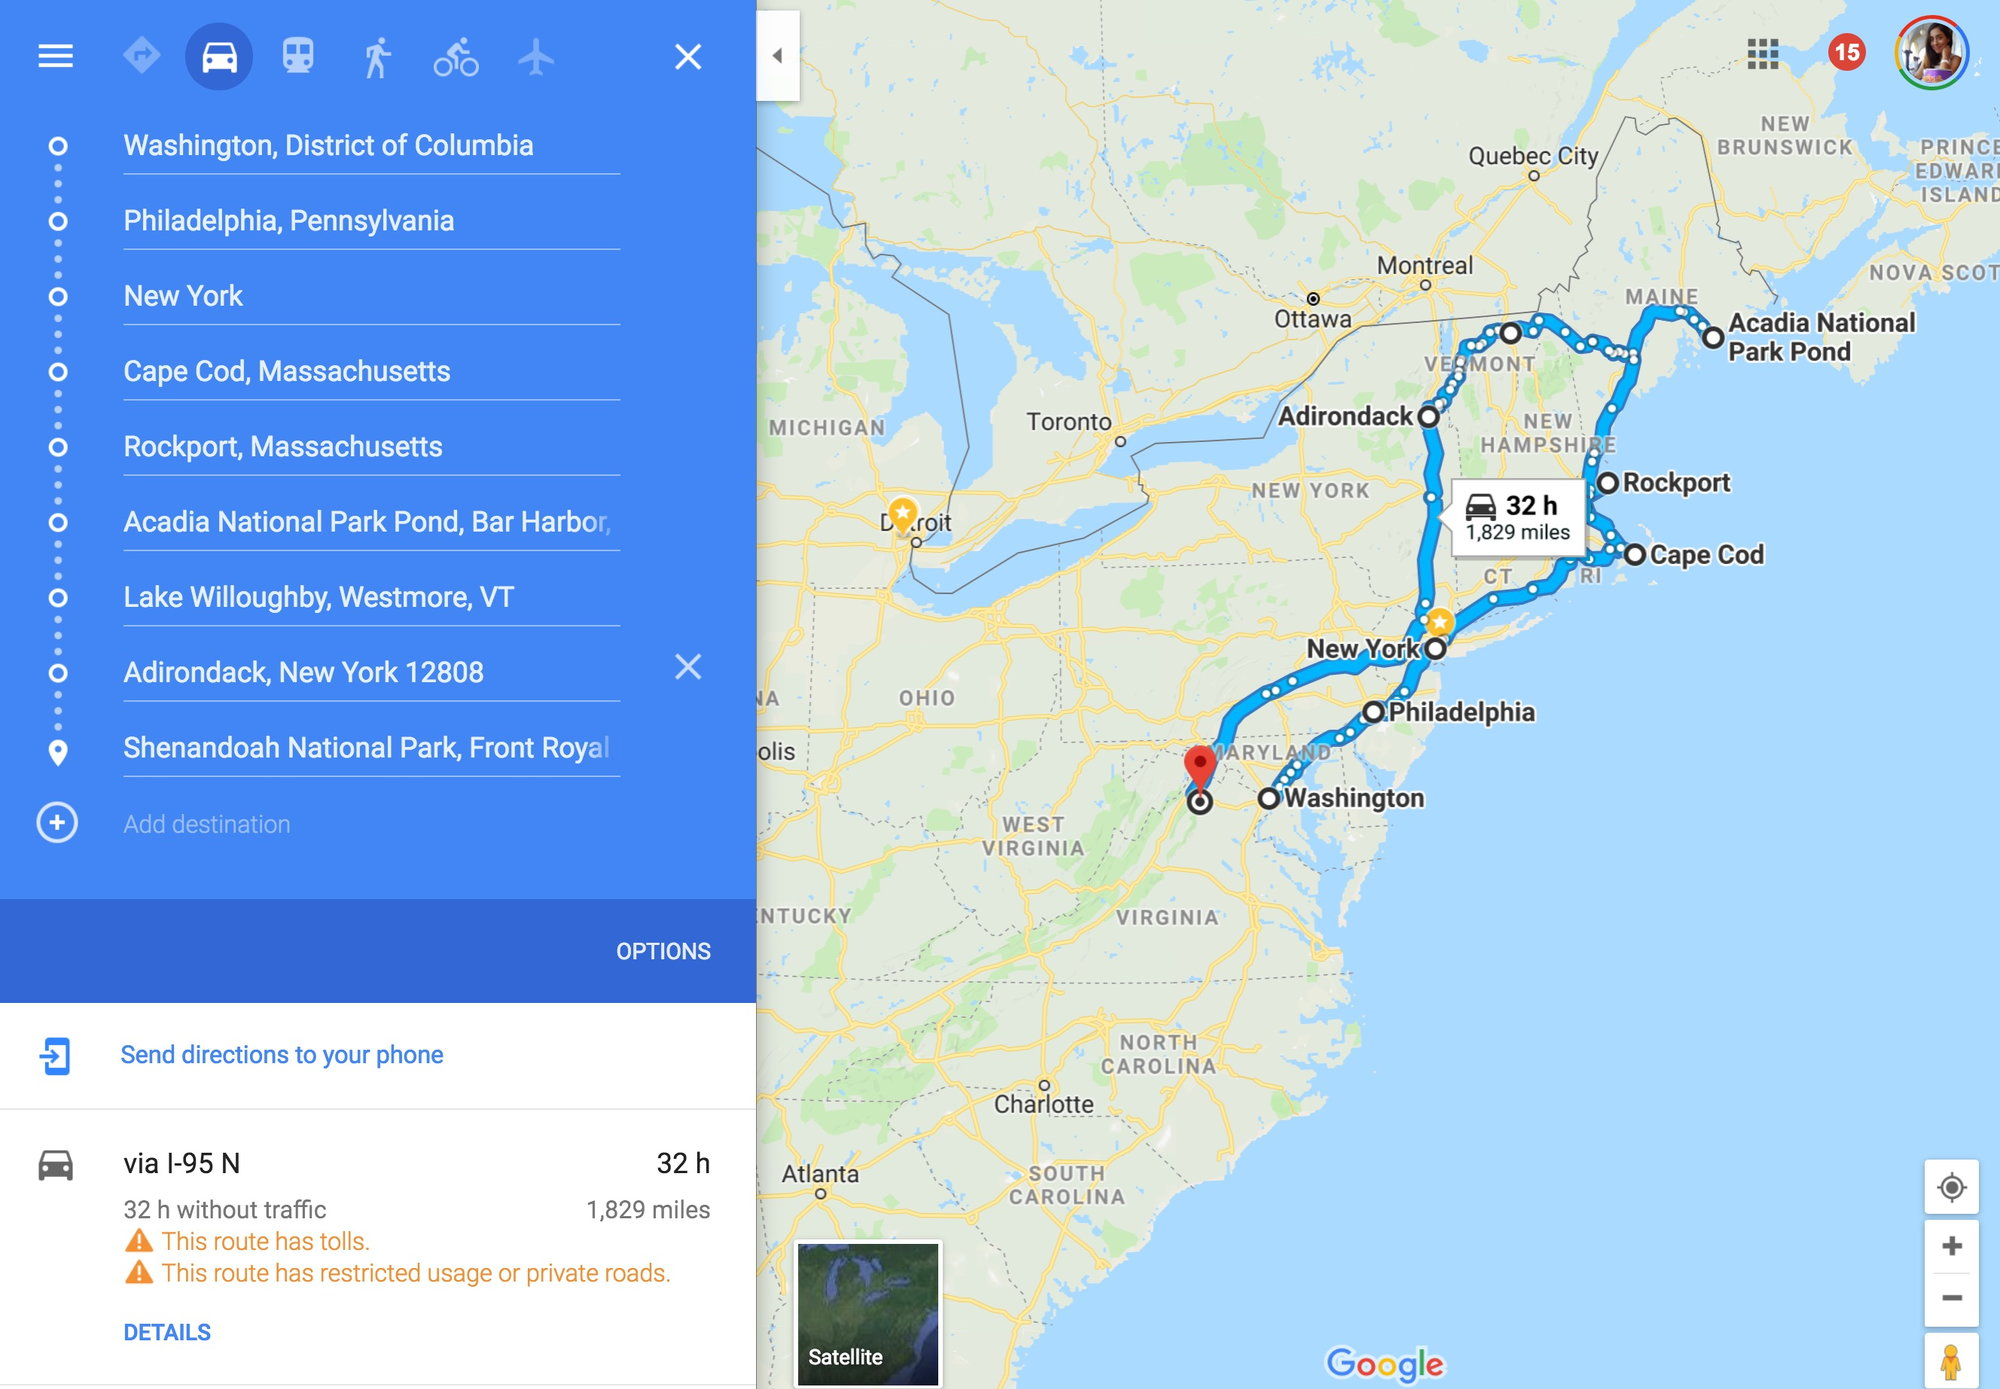 US East Coast Road Trip Itinerary Suggestions - Fodor\'s Travel Talk ...